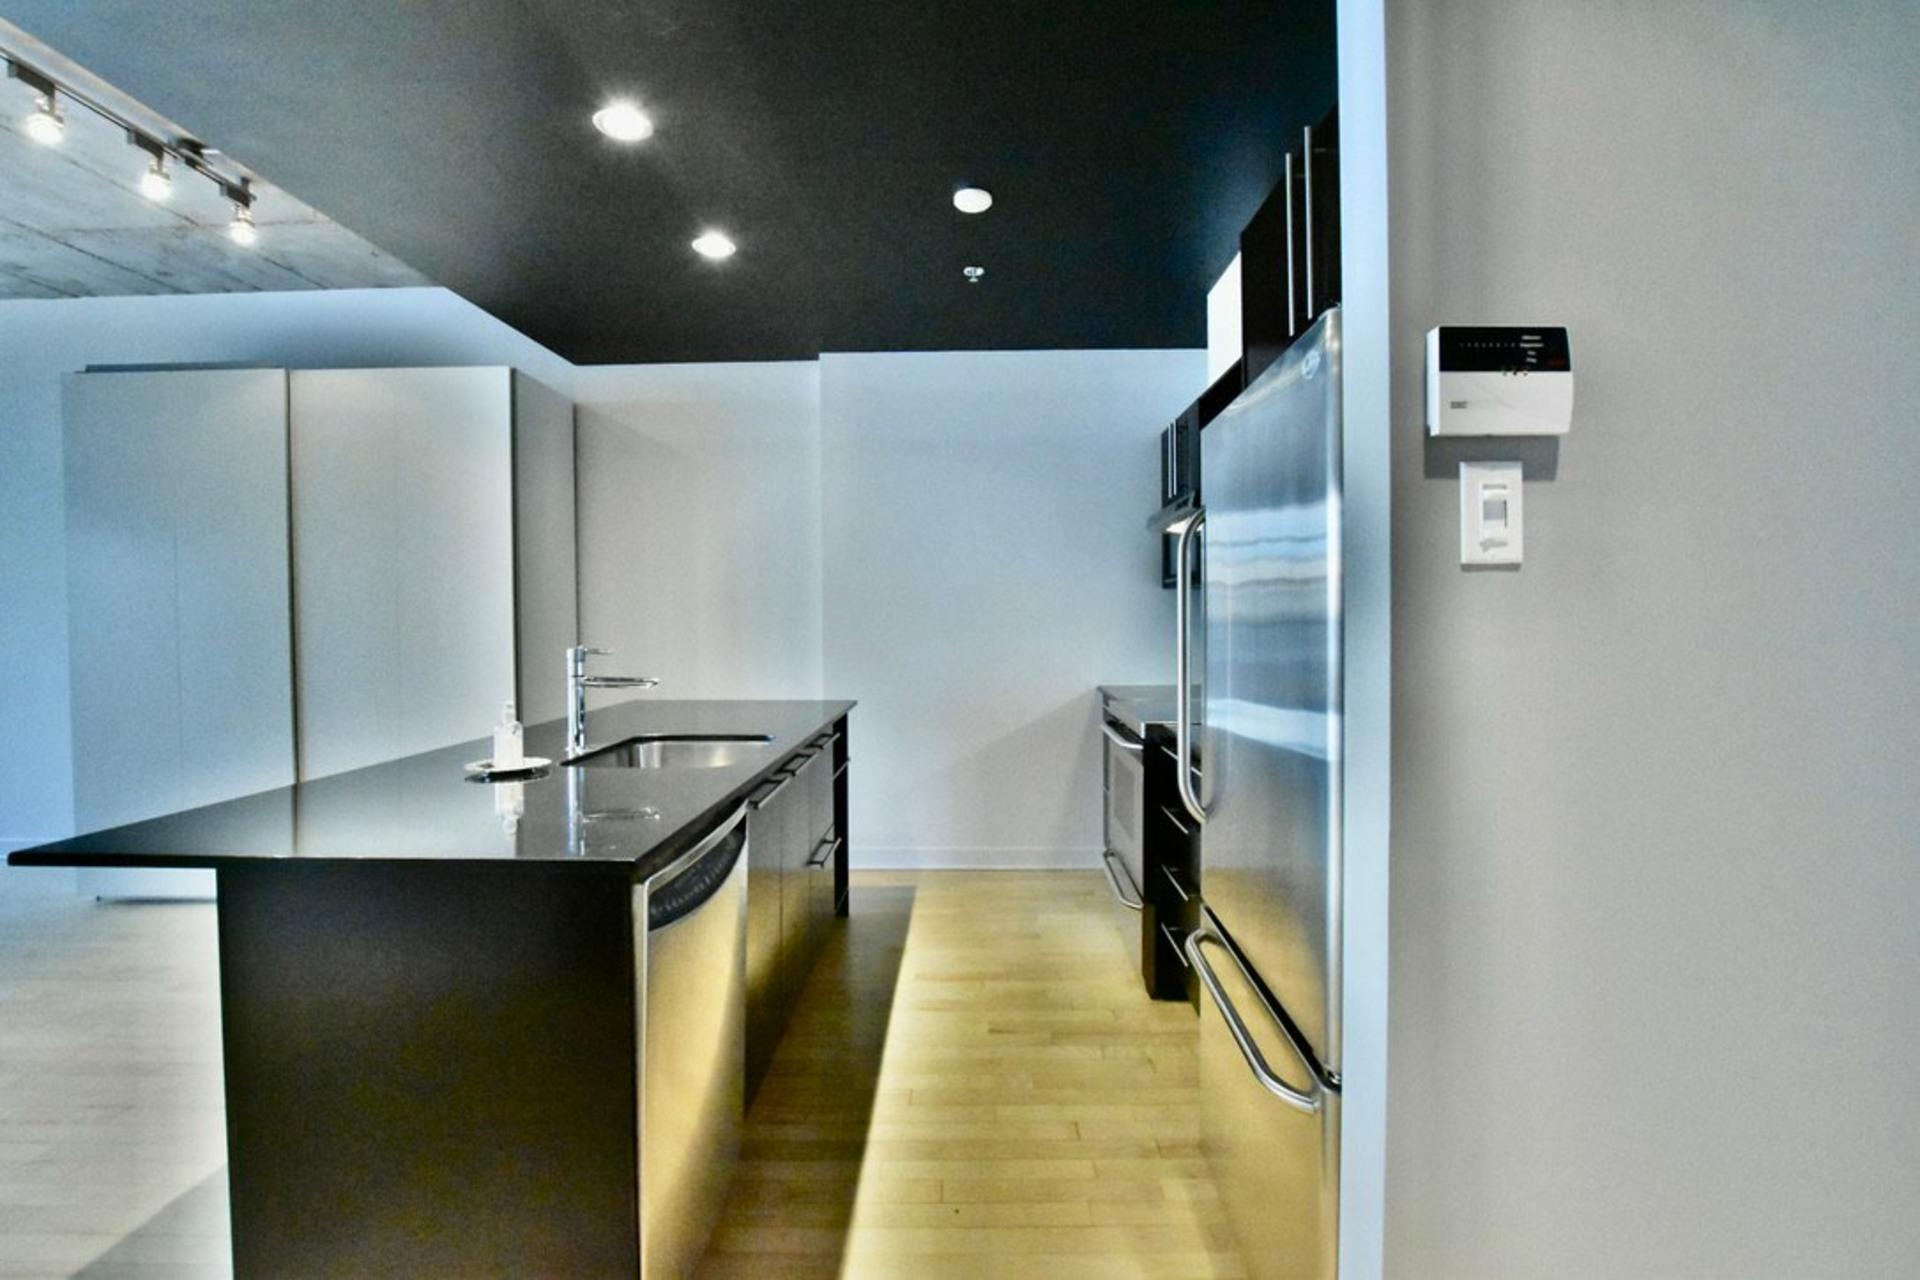 image 10 - Departamento Para alquiler Villeray/Saint-Michel/Parc-Extension Montréal  - 3 habitaciones